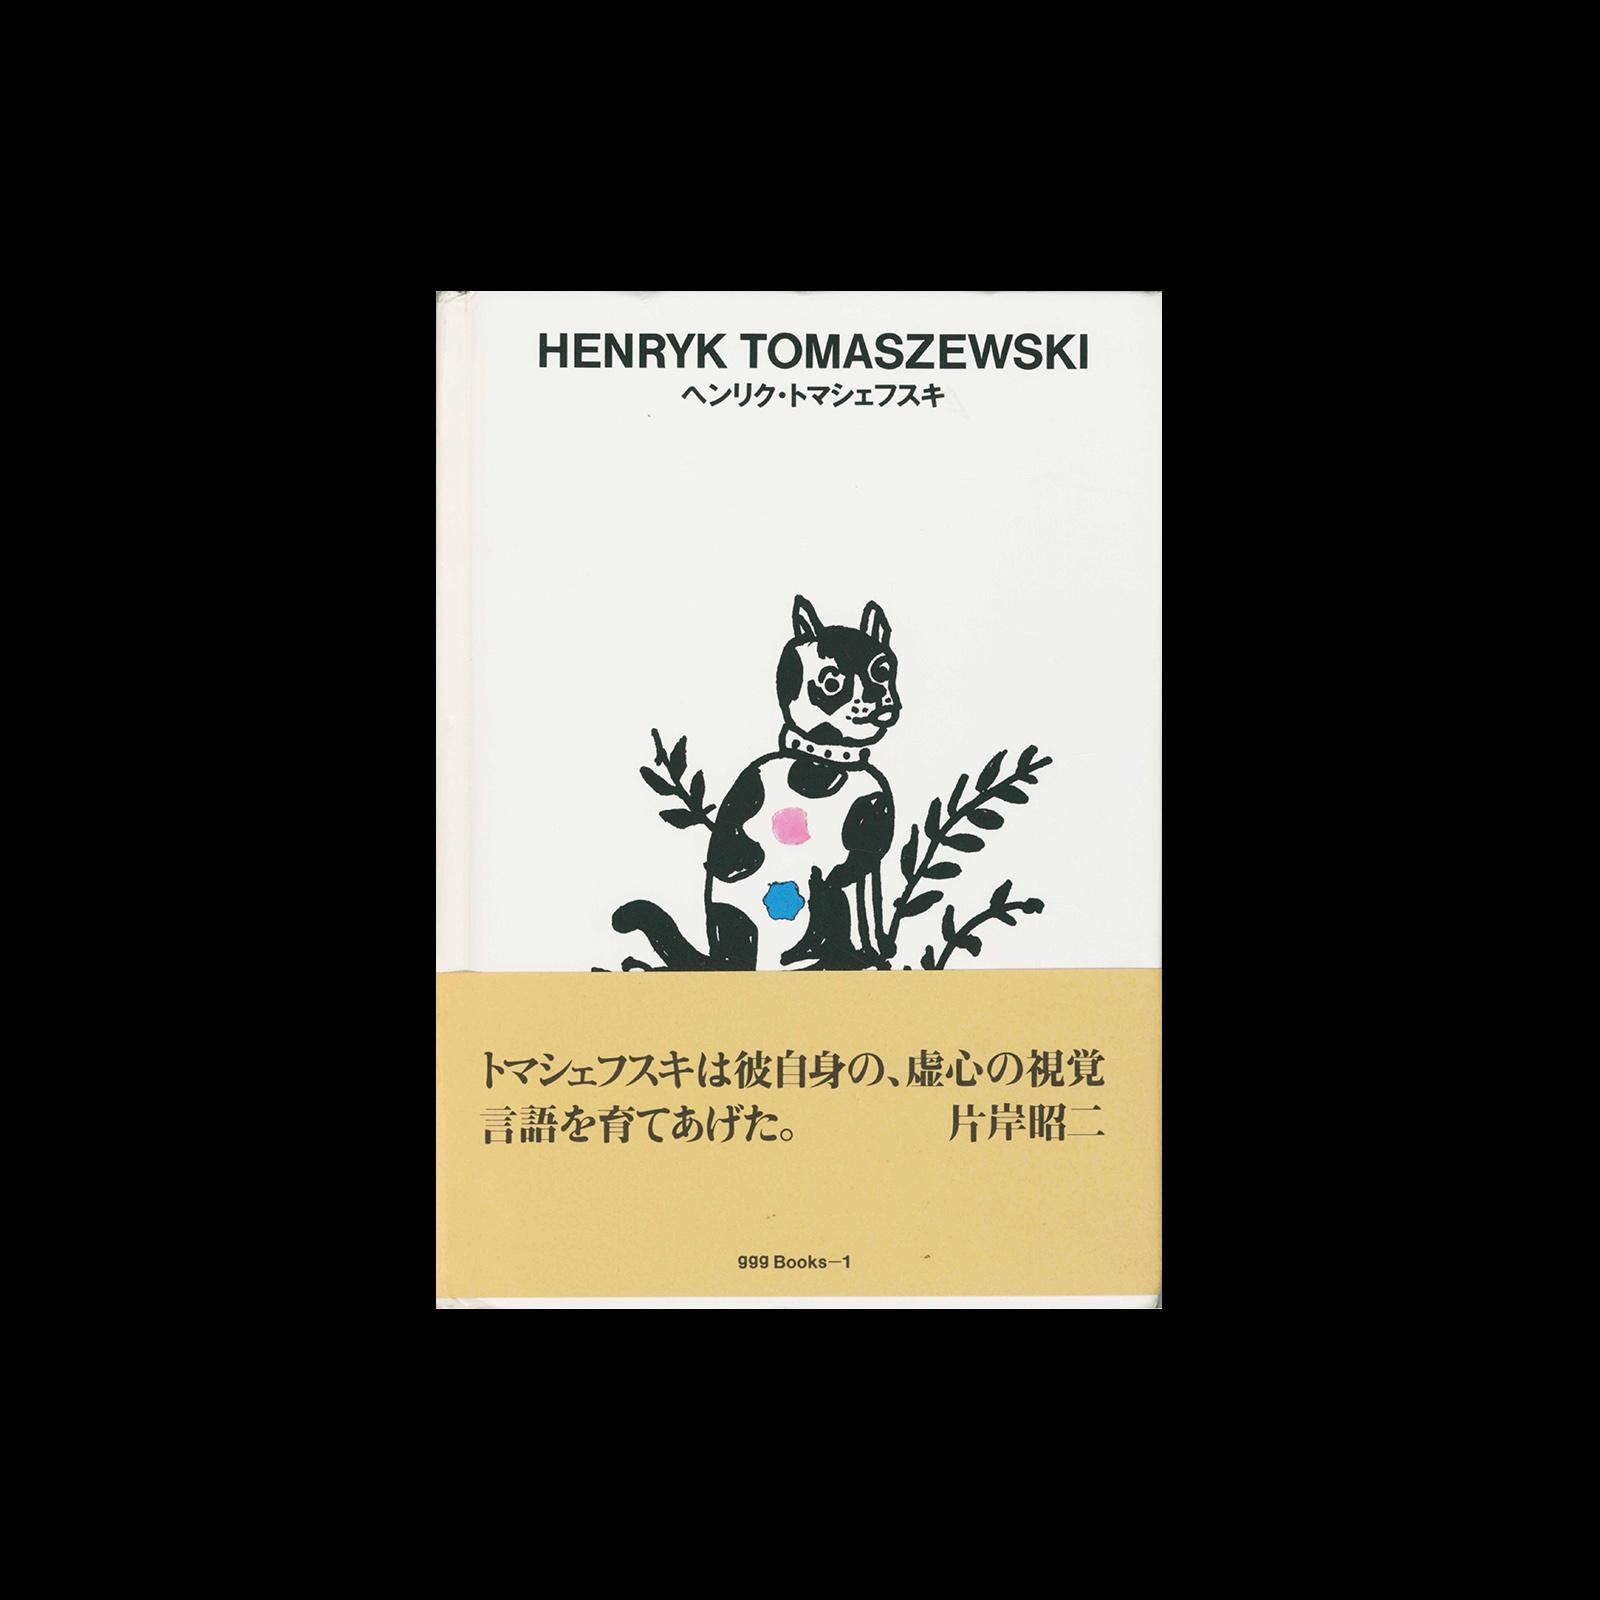 Ginza Graphic Gallery 01, Henryk Tomaszewski